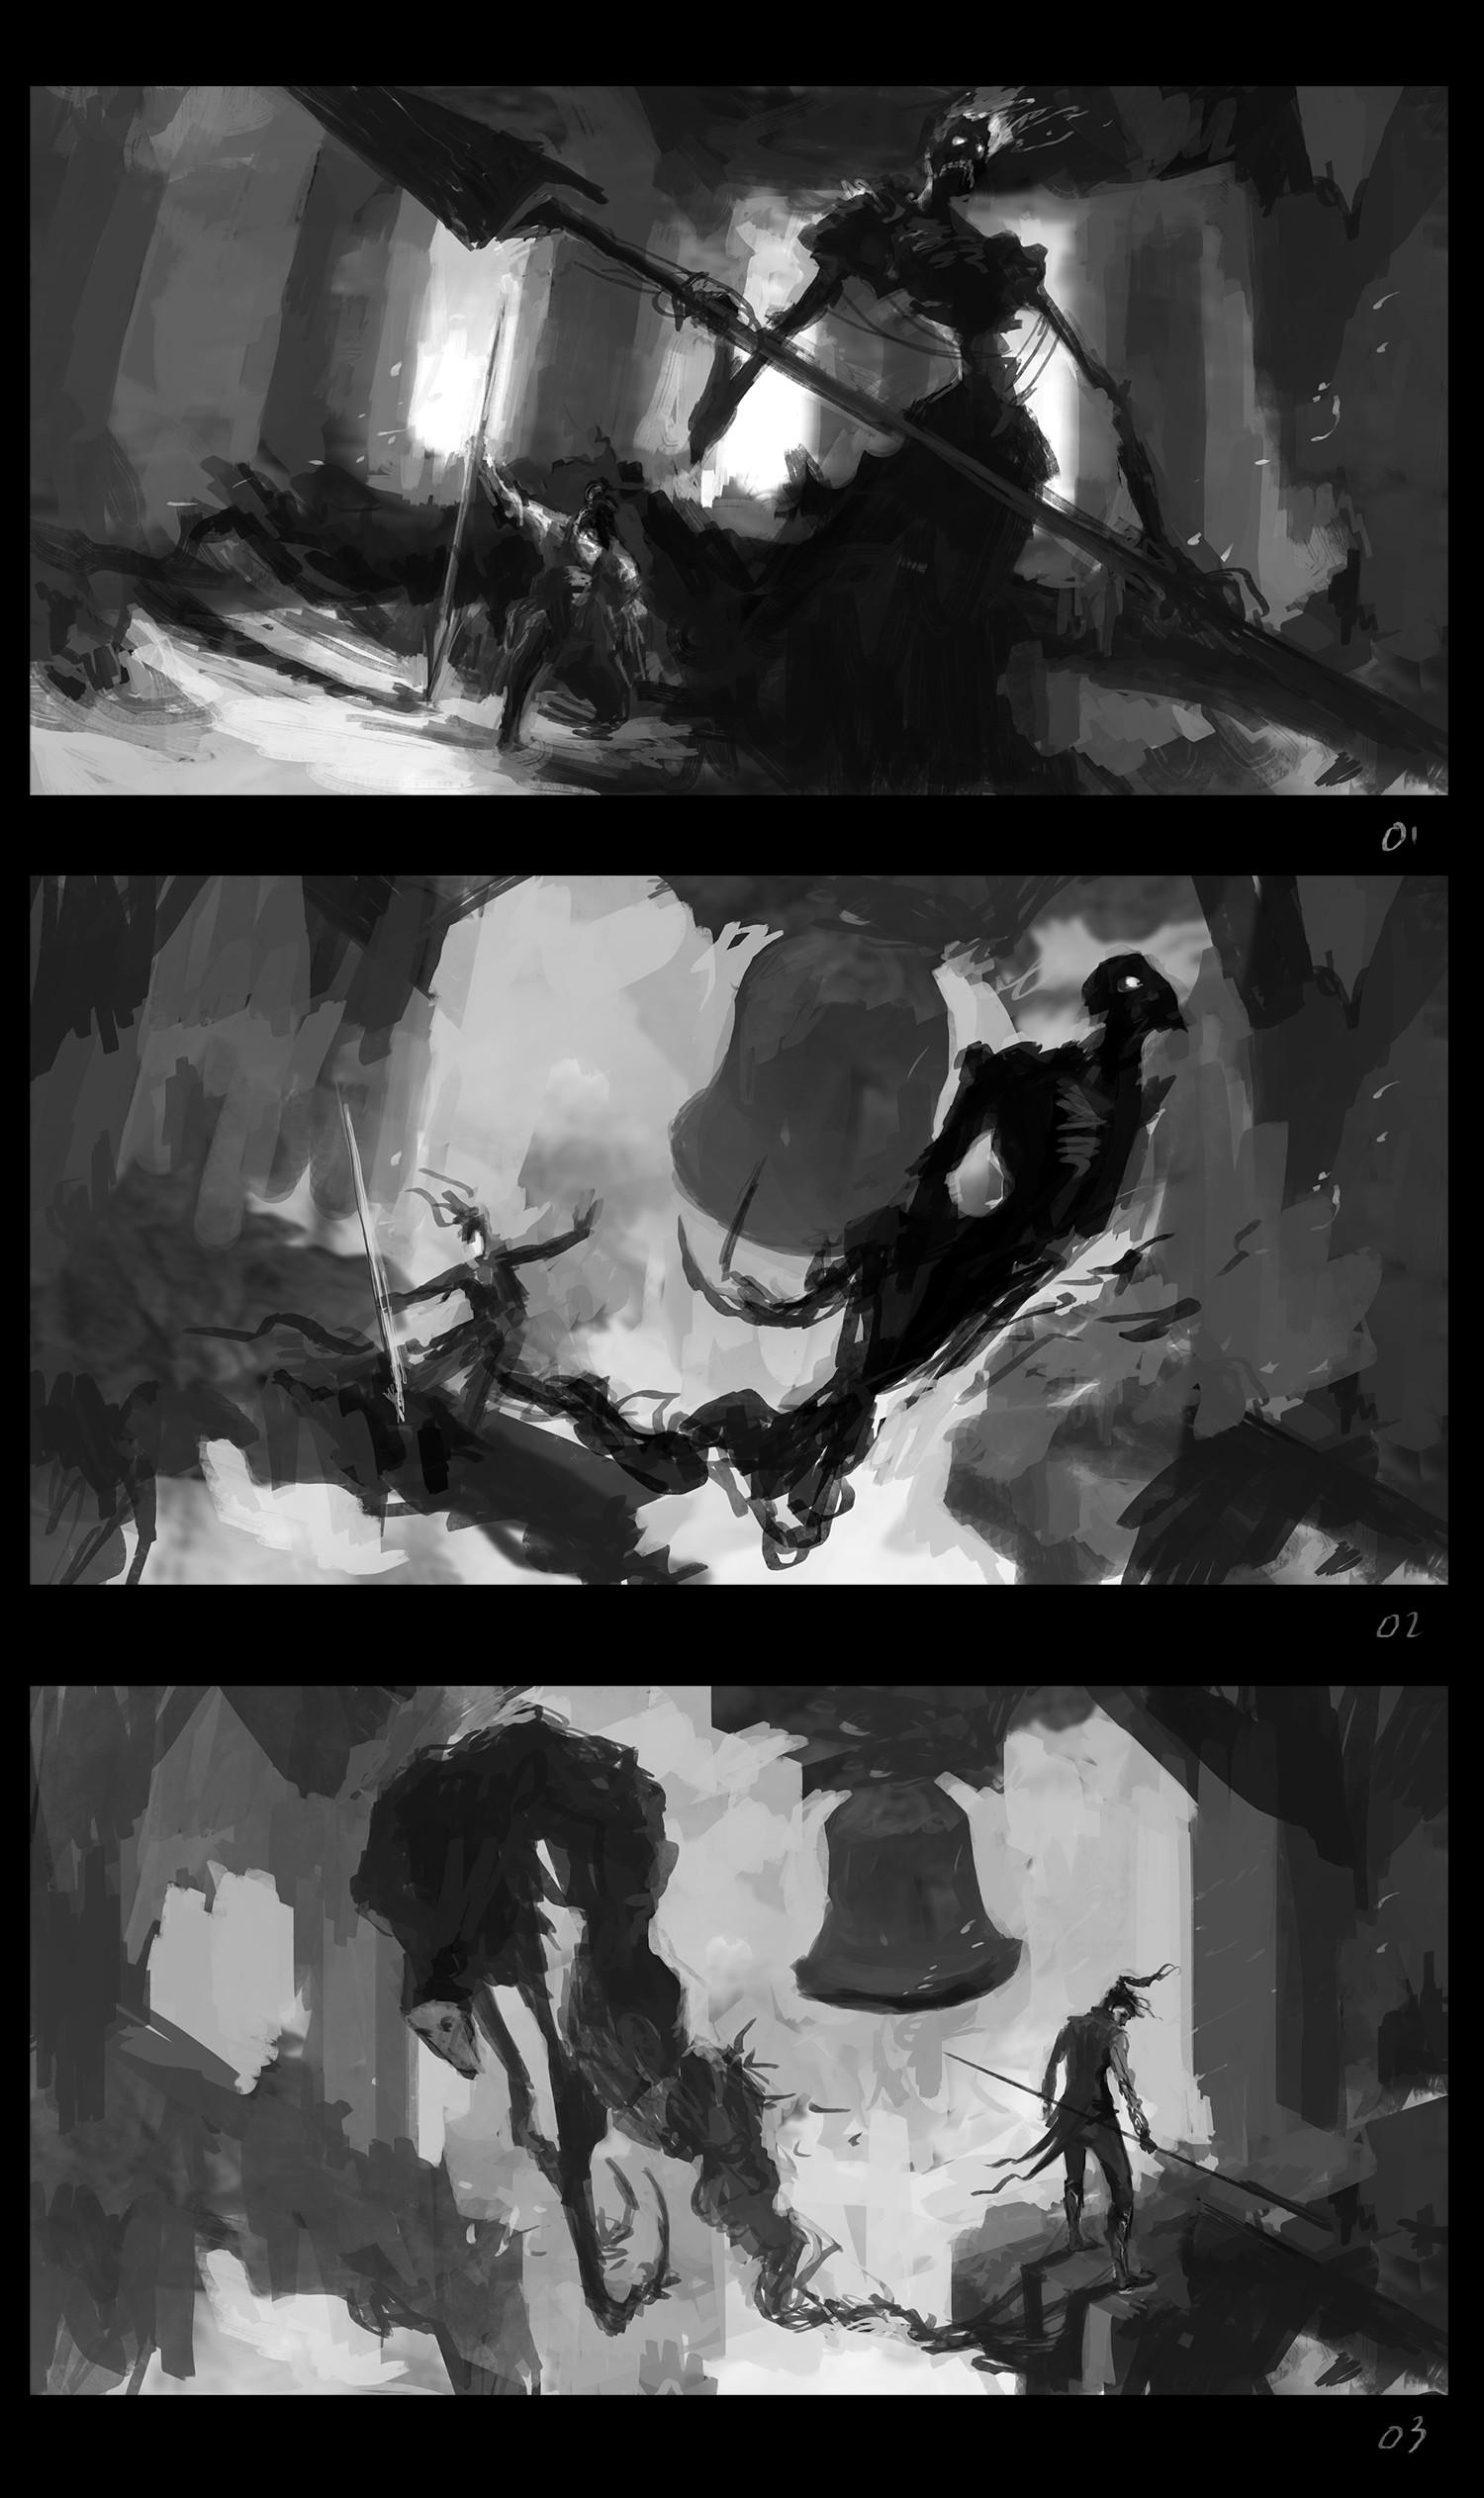 Alexandre chaudret dos herald sketches